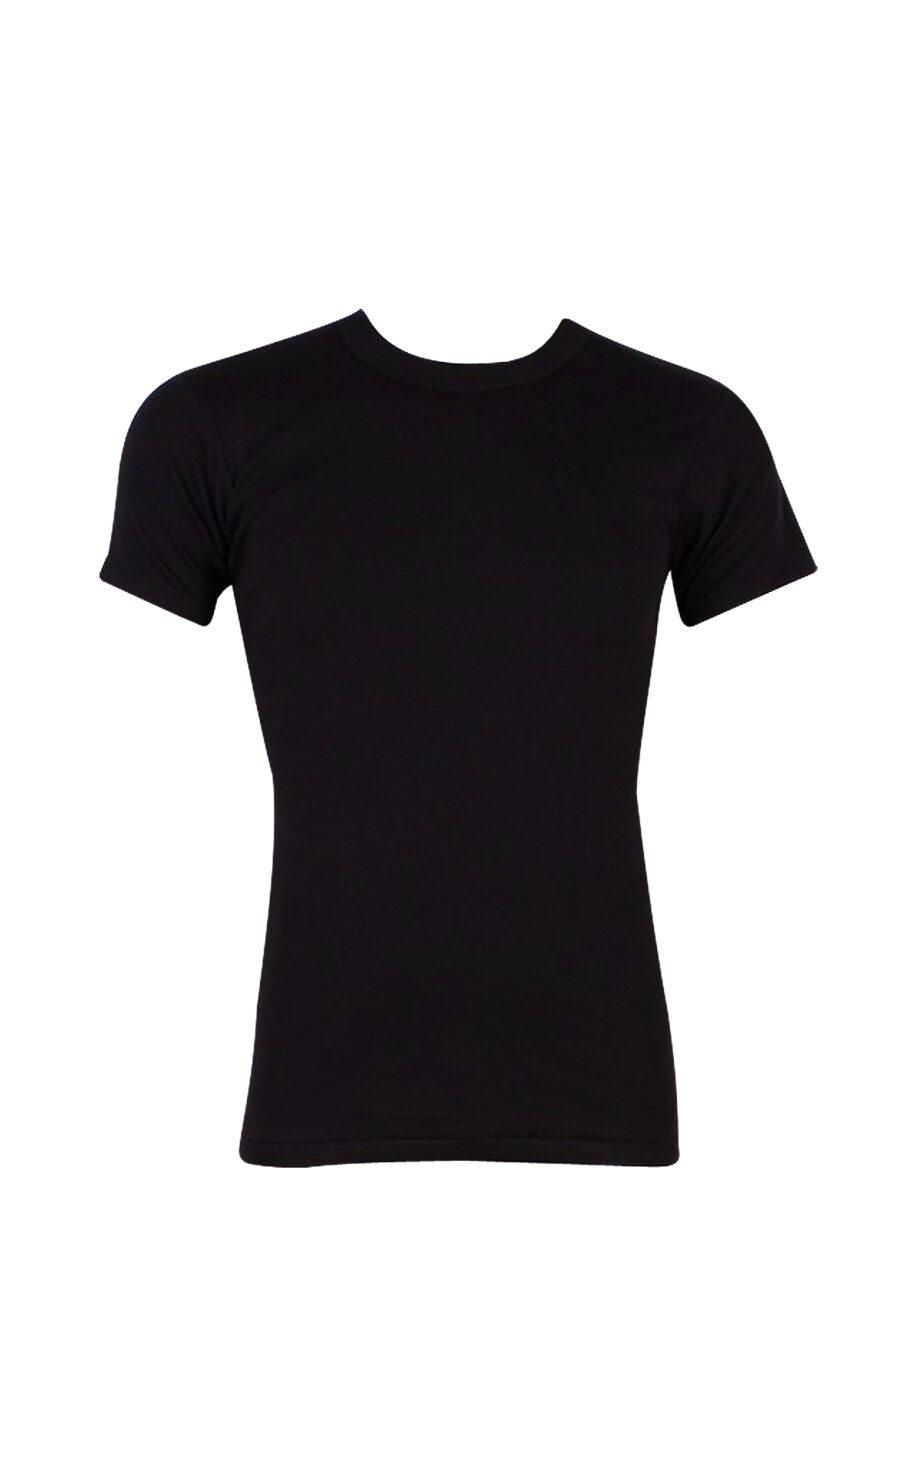 90-18112-45-minerva-fanela-black-.jpg